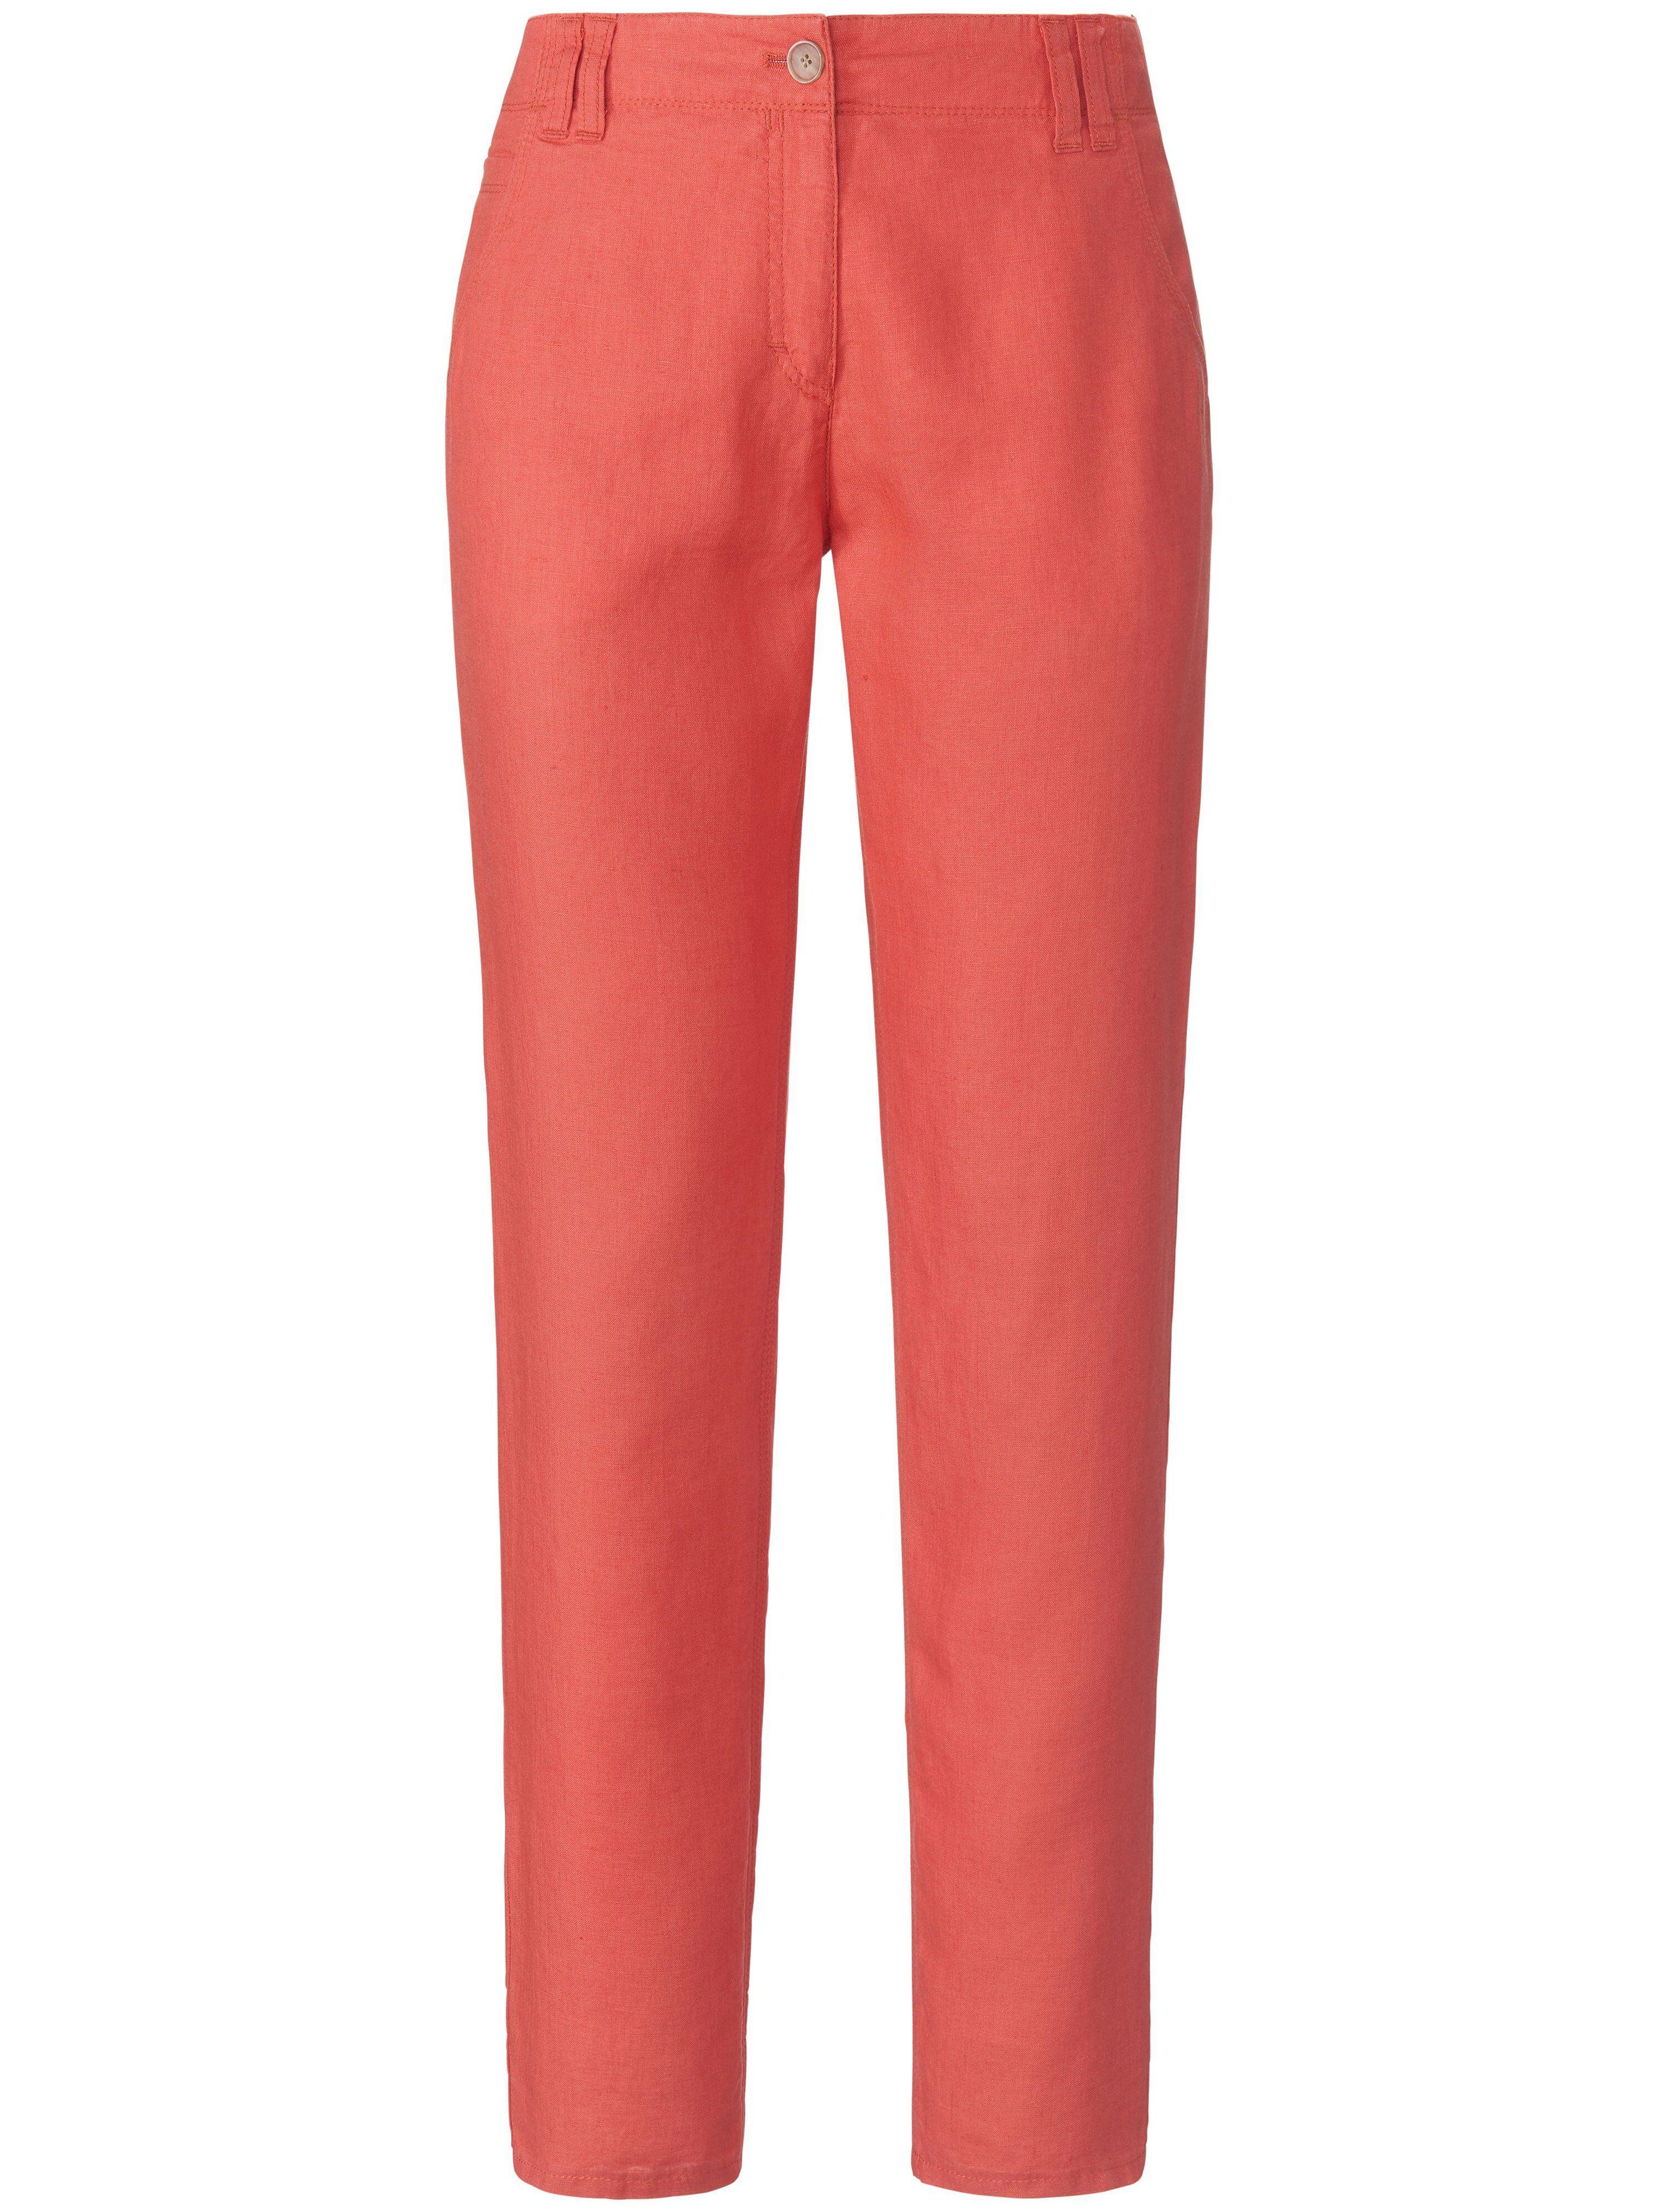 Brax Le pantalon 100% lin modèle Melo  Brax Feel Good rouge  - Femme - 40